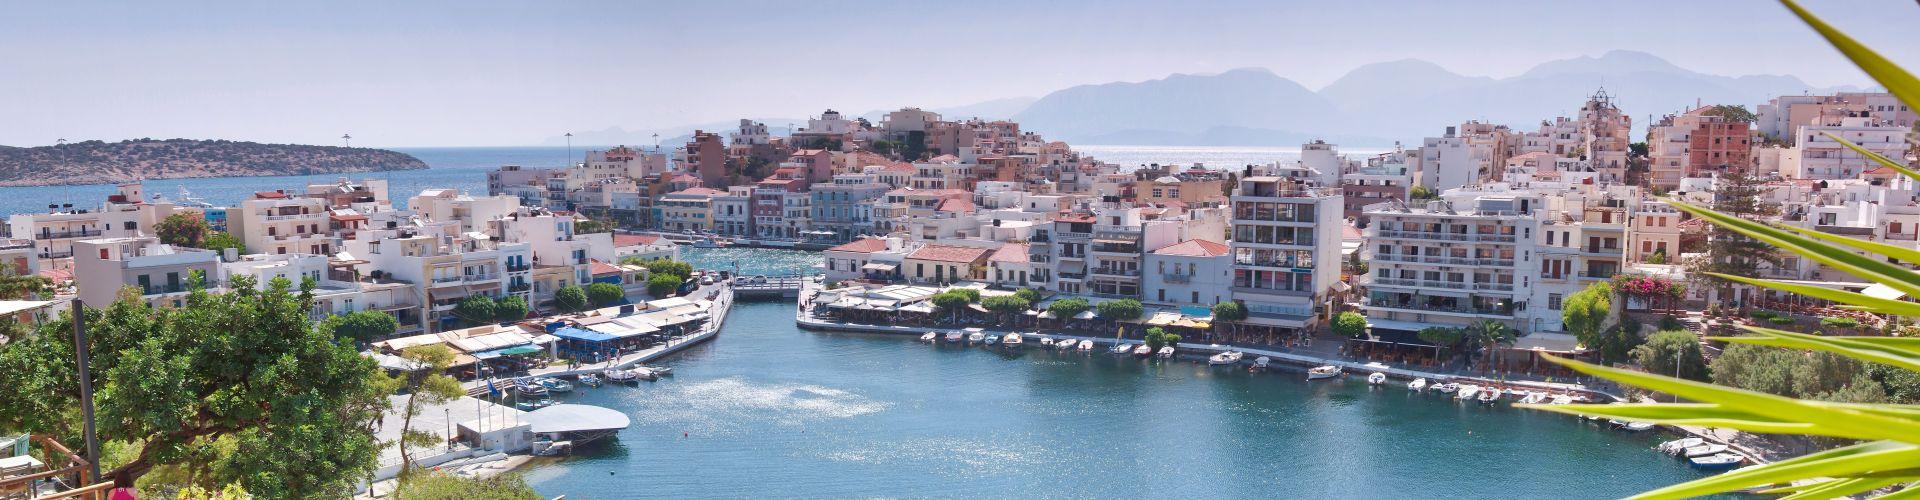 Singlereisen Kreta Griechenlands Sonneninsel Sunwave De